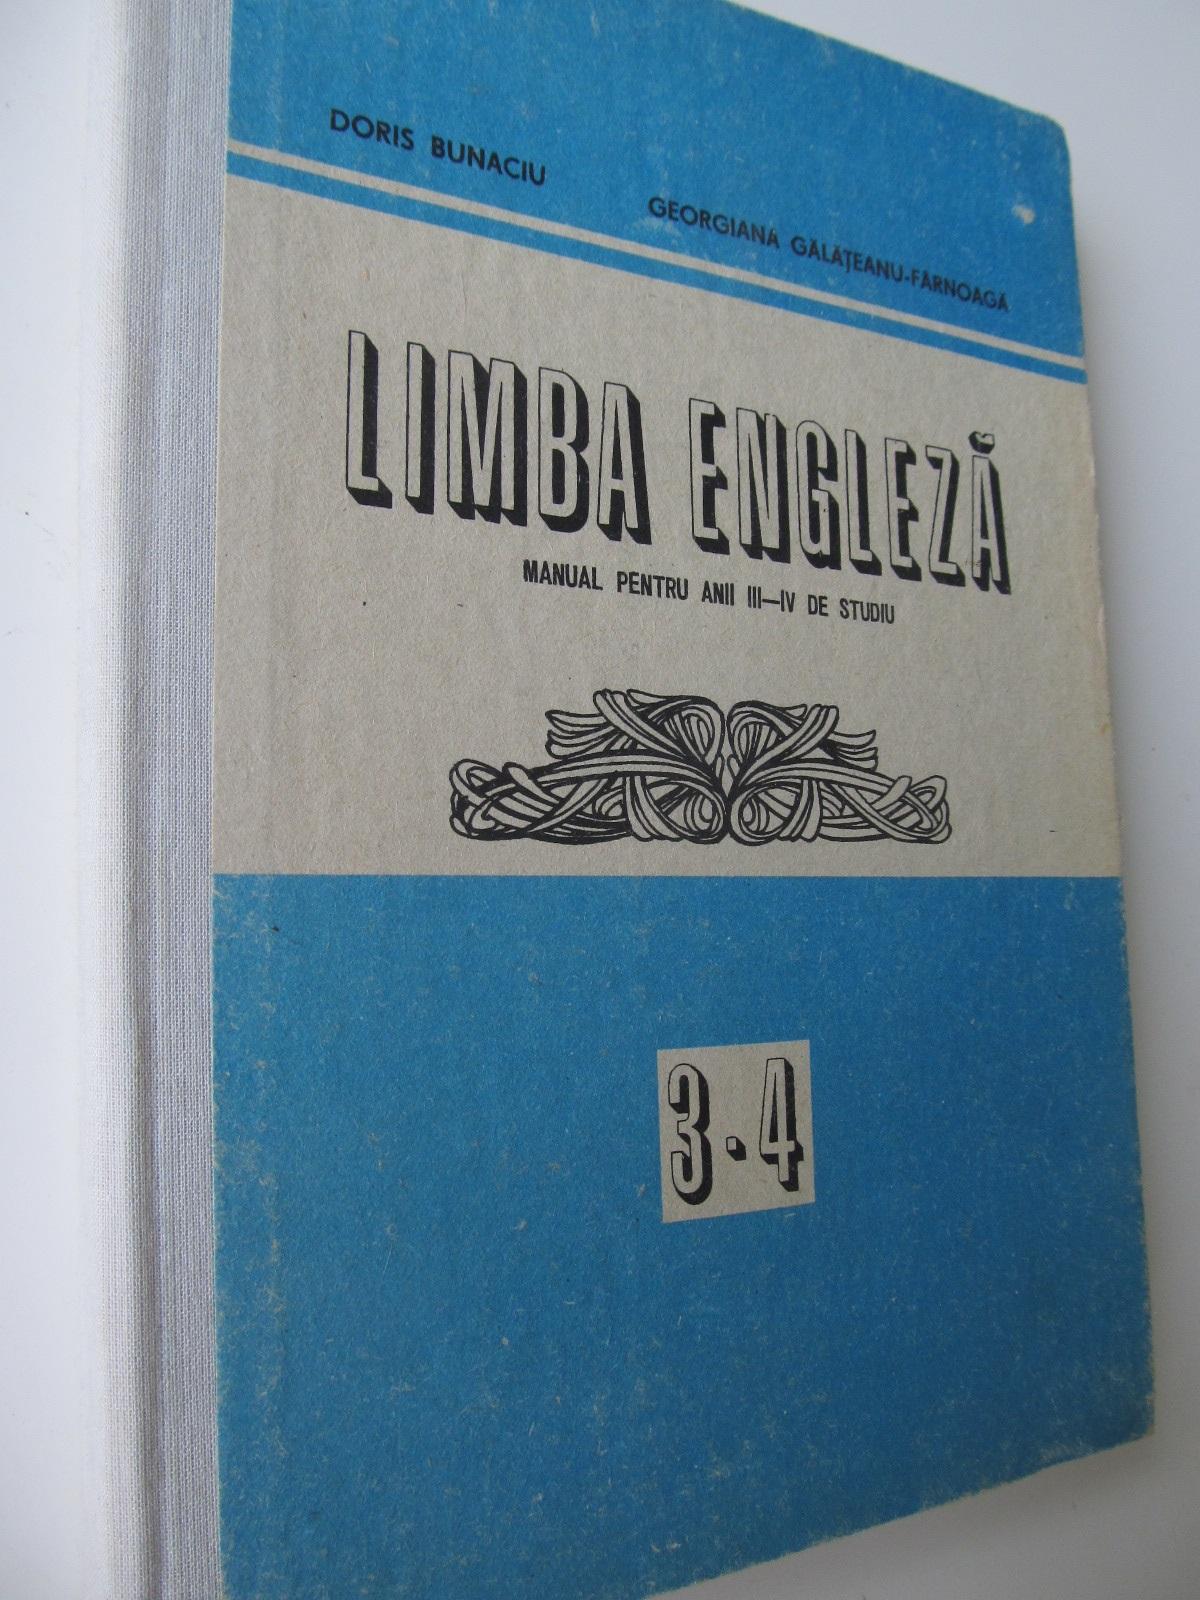 Limba Engleza manual pt. anii III-IV de studiu - Doris Bunaciu , ... | Detalii carte